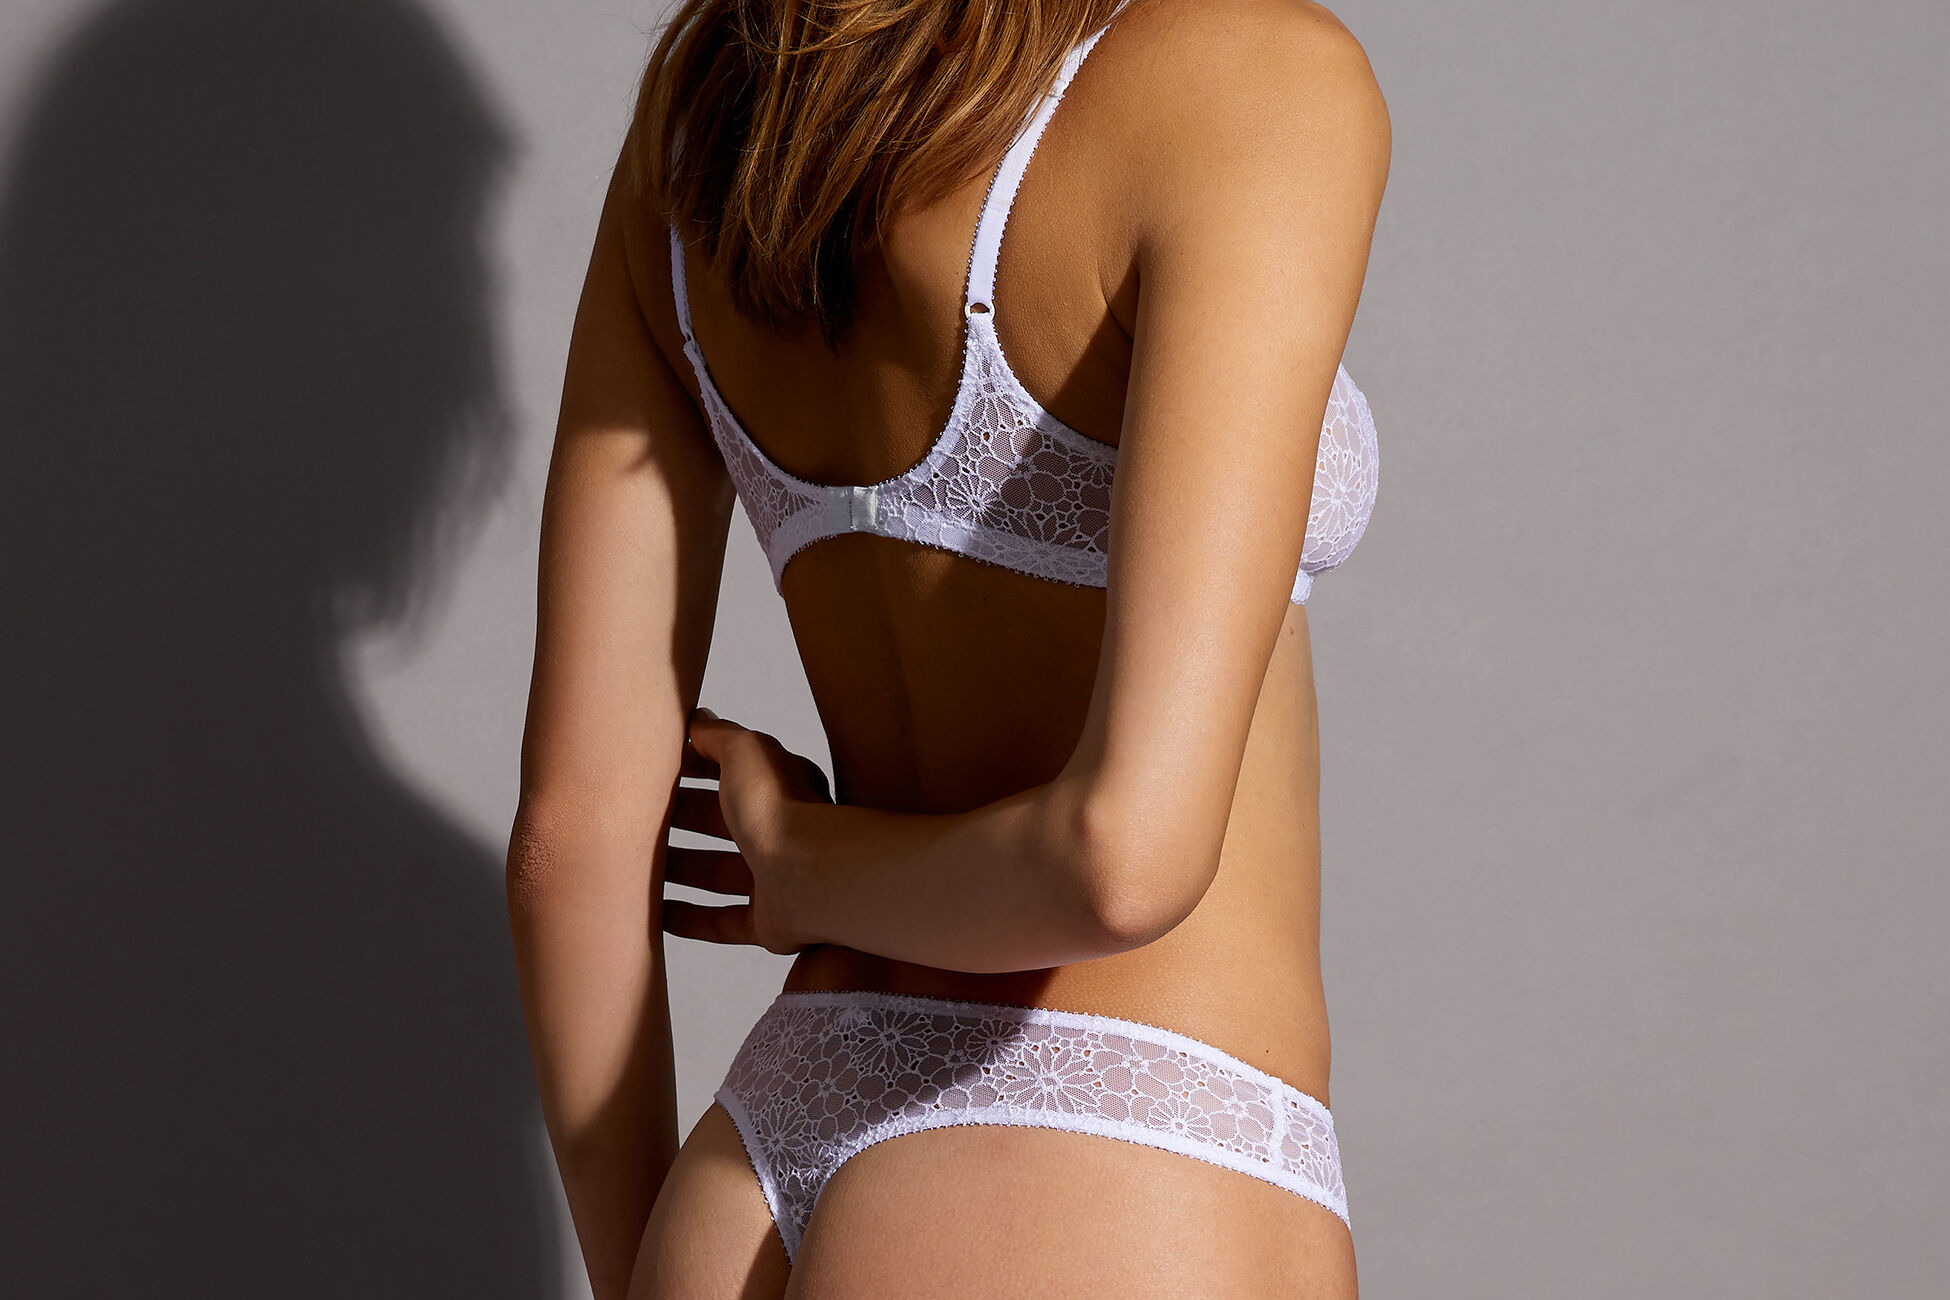 Romance Crop top bra standard view �